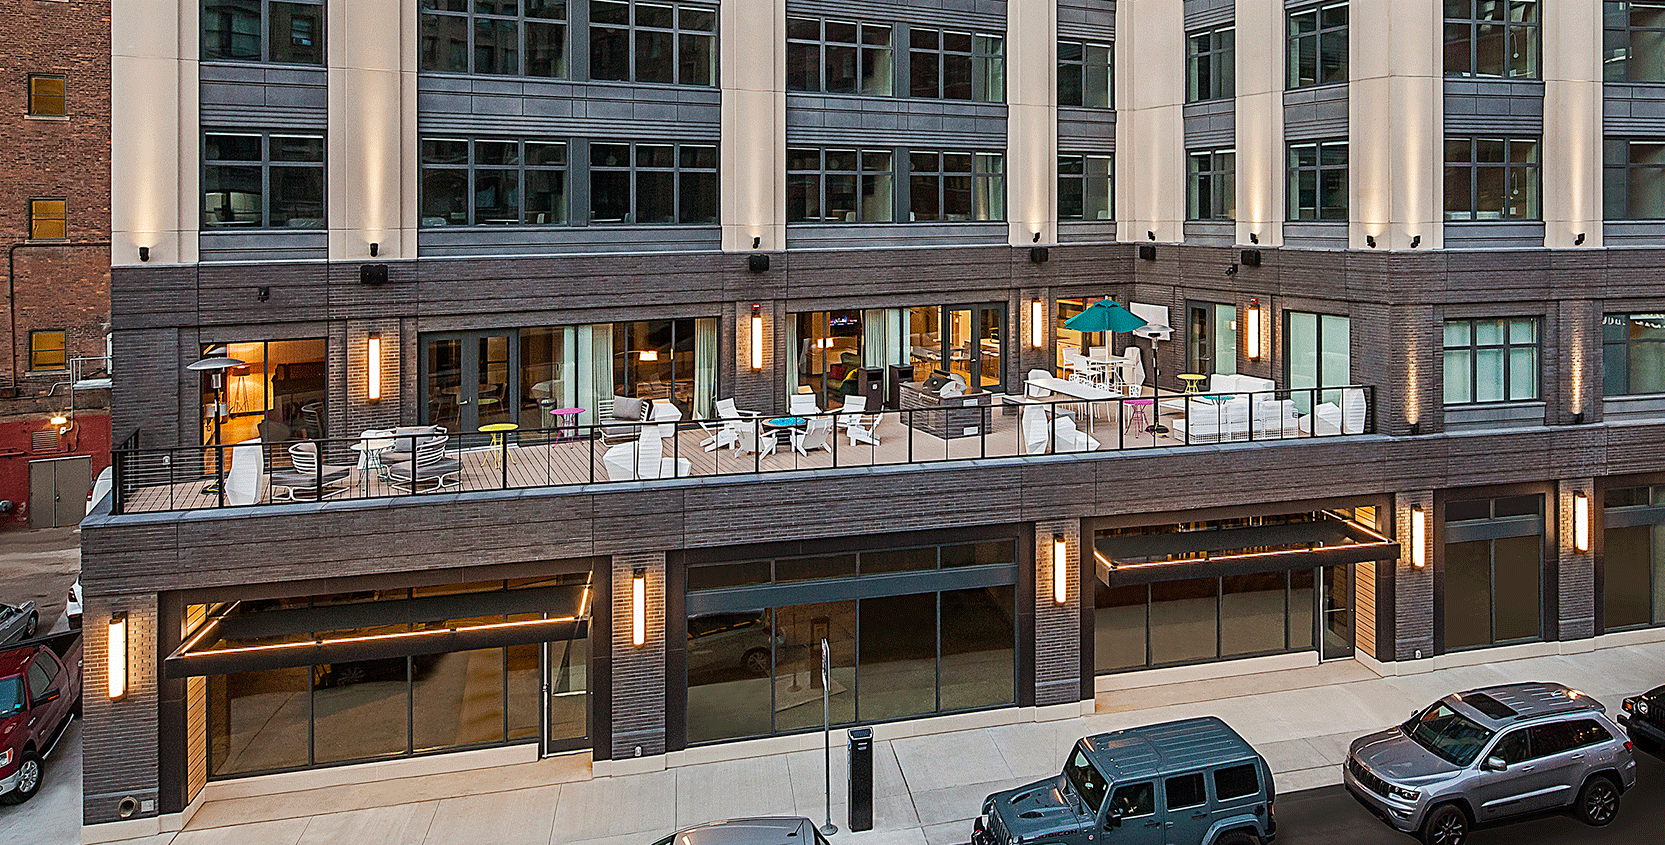 28 W Grand Lofts-Exterior-Facade-2-1665x845